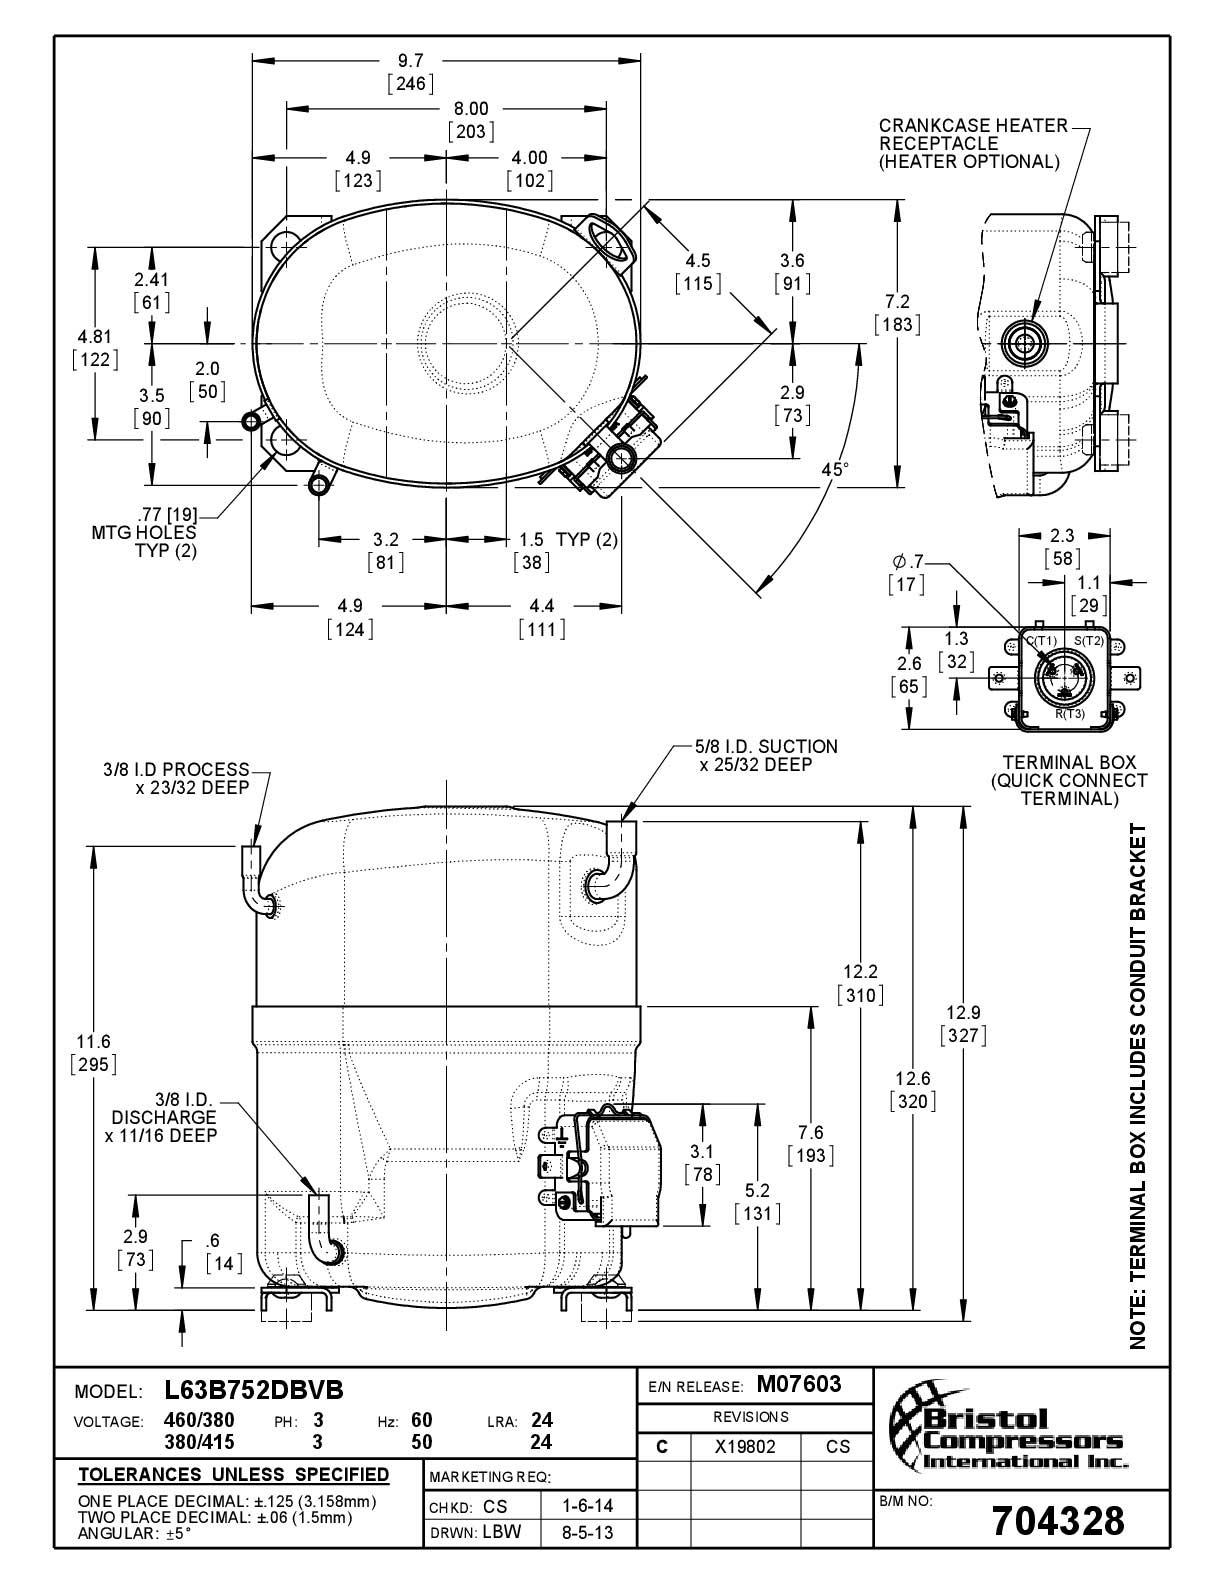 Bristol L63B752DBVB характеристики